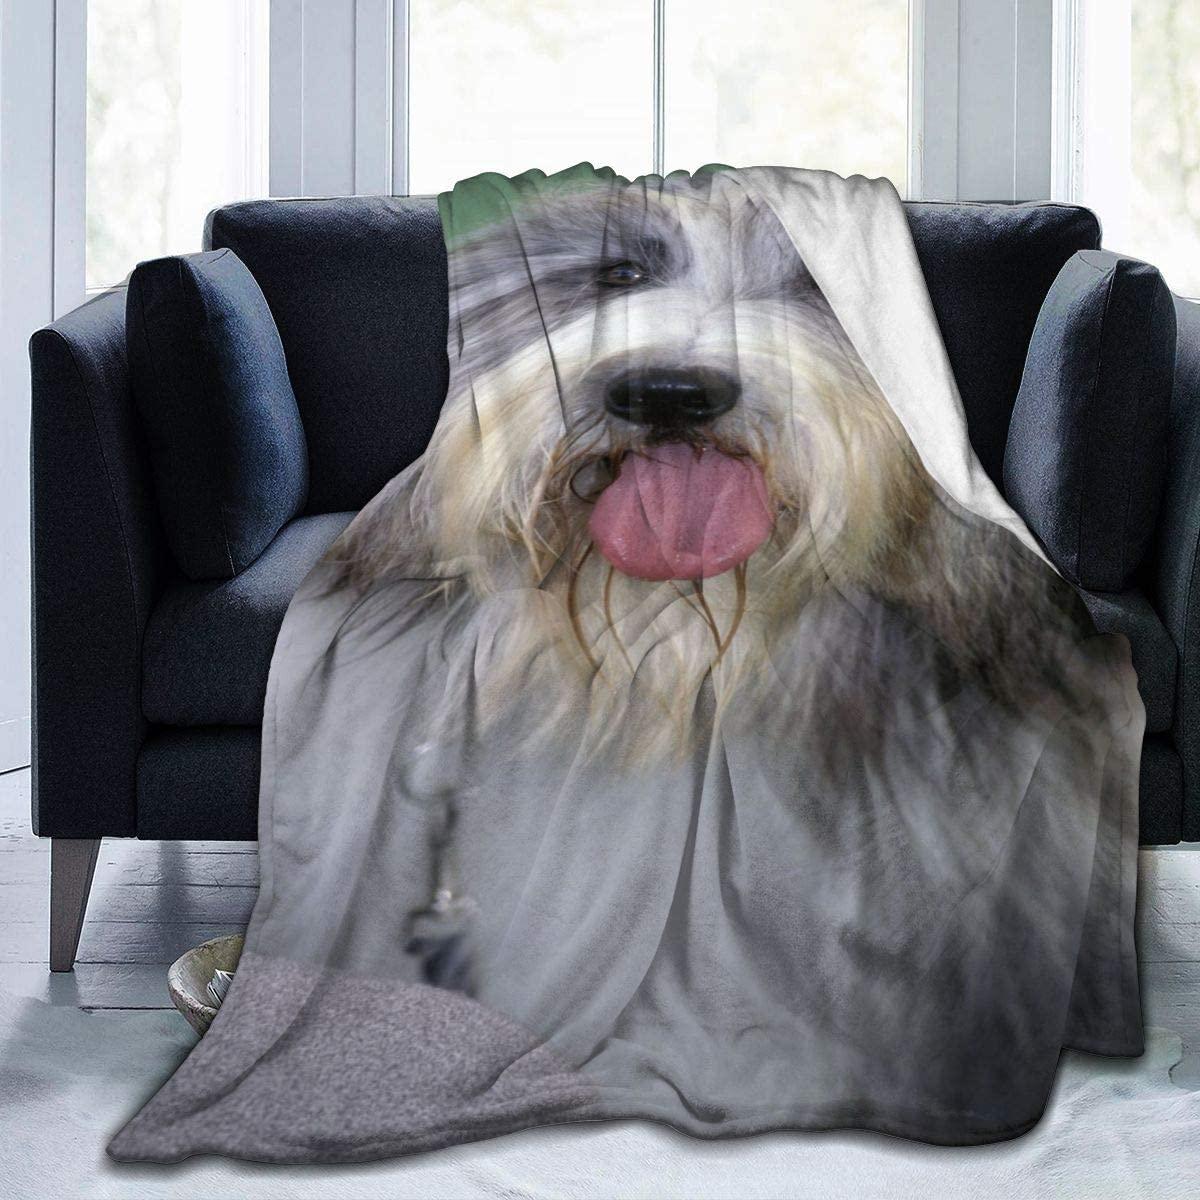 Micro Fleece Plush Soft Baby Blanket Blissful Bearded Collie Dog Fluffy Warm Toddler Bed/Crib Blanket Lightweight Flannel Daycare Nap Kids Sleeping Tummy Time Throw Blanket Girls Boy Kid/Baby